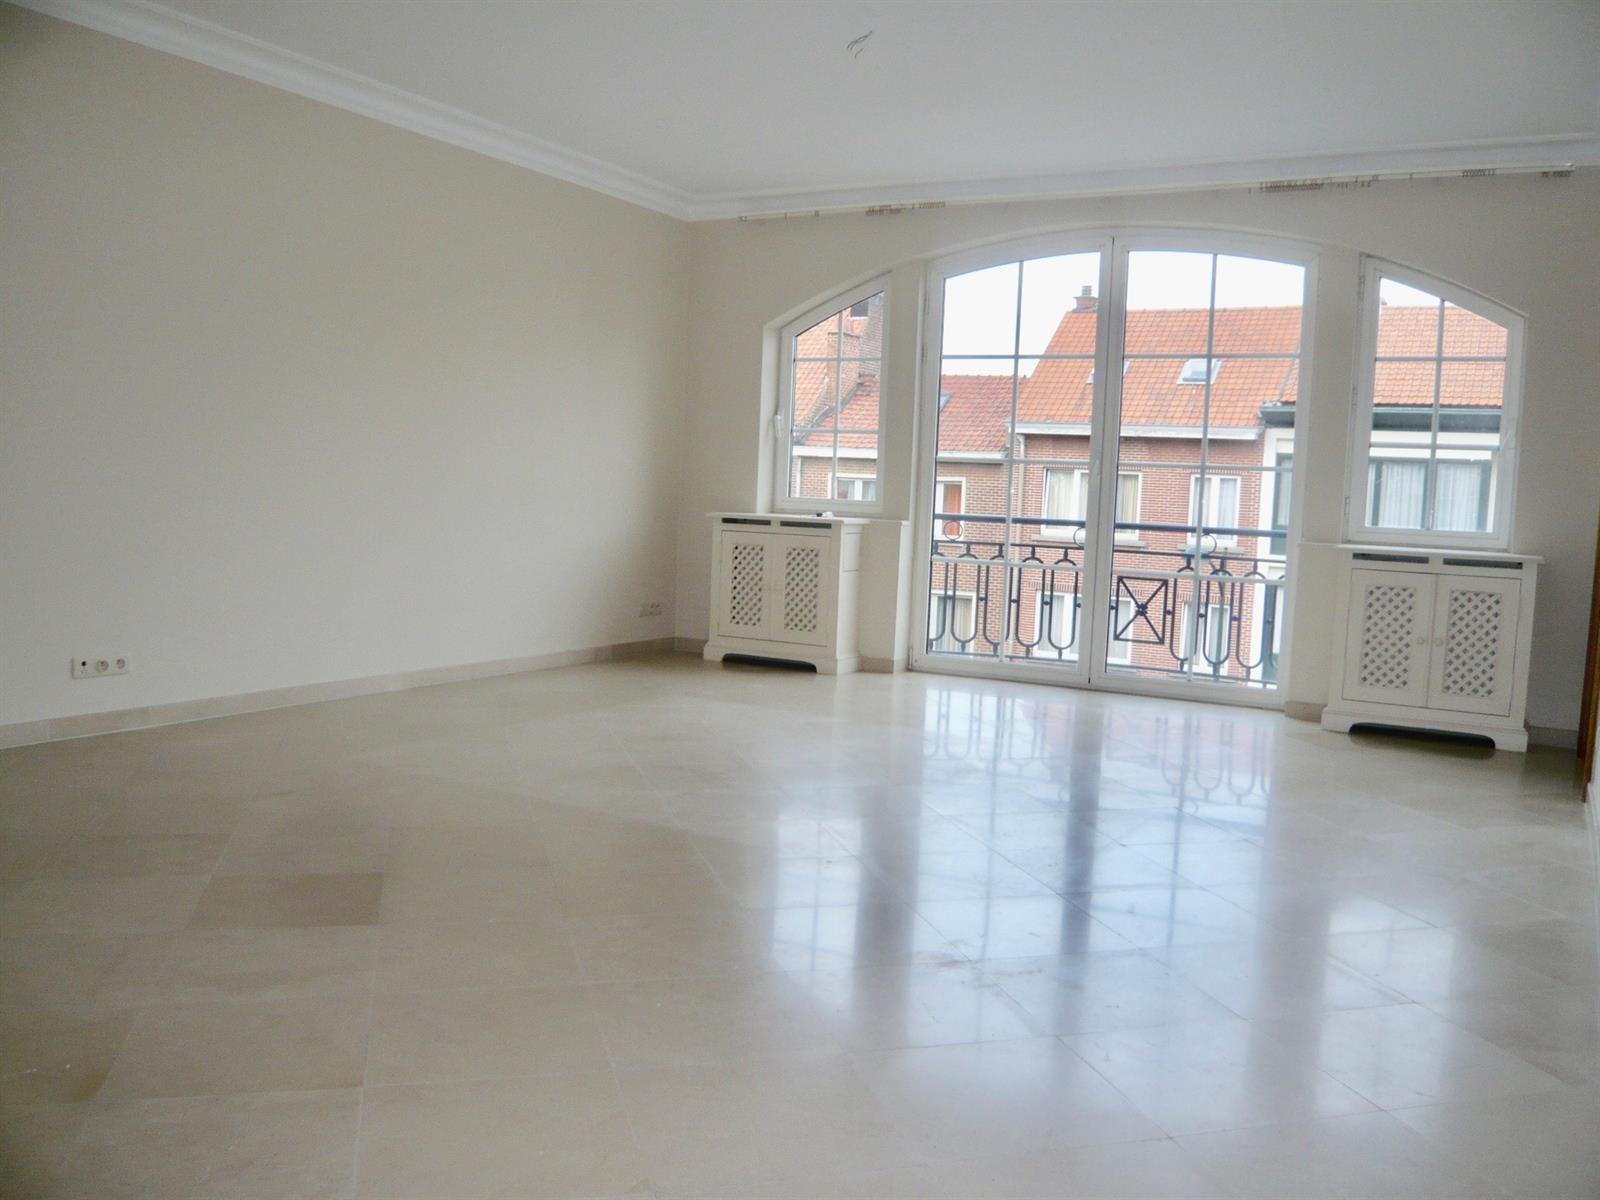 Appartement exceptionnel - Woluwe-Saint-Pierre - #4433517-21